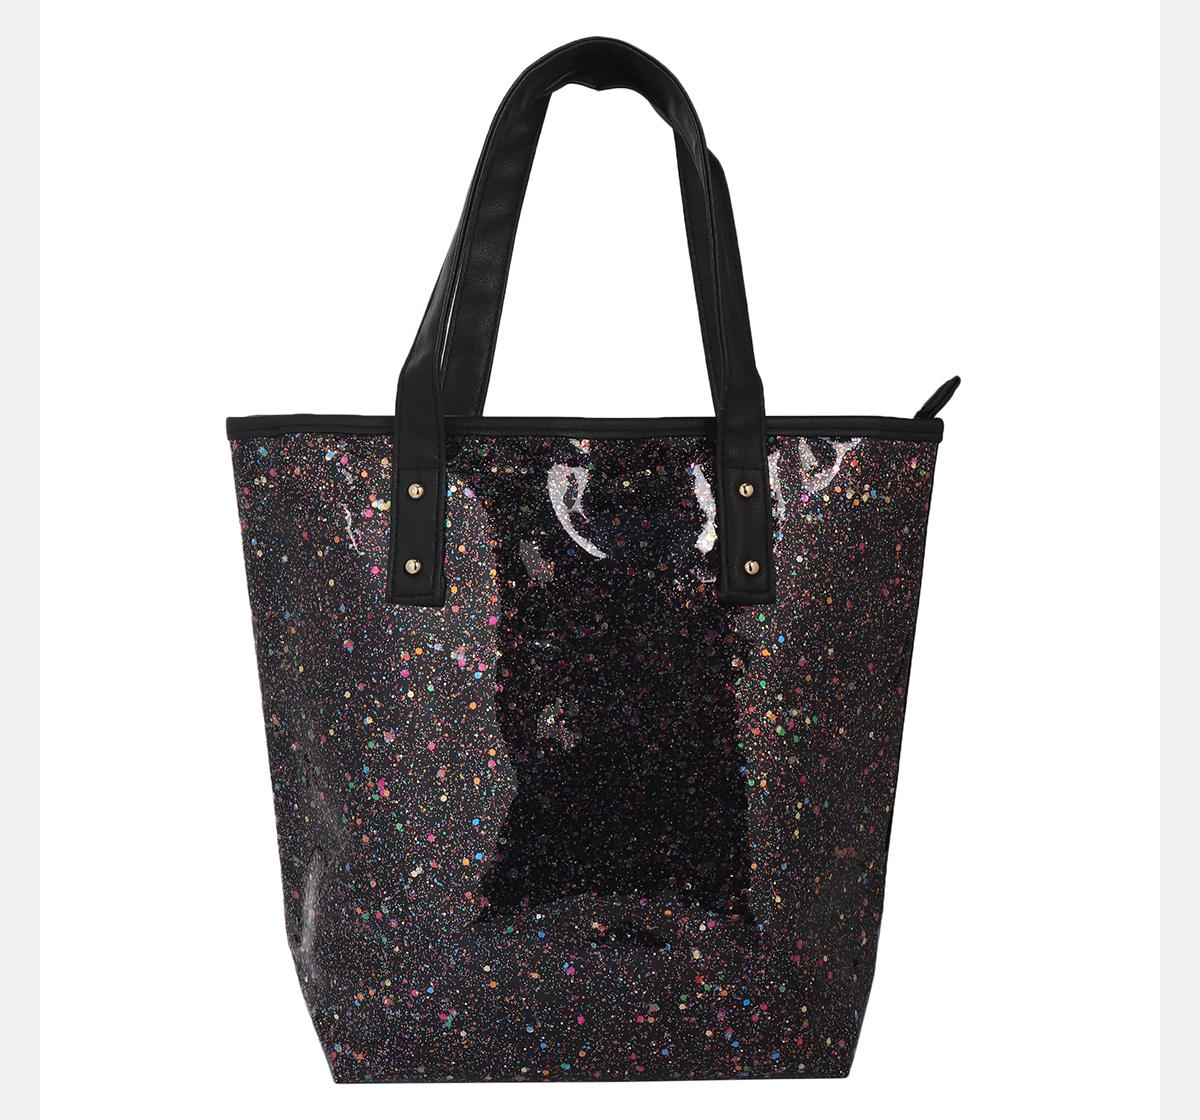 Hamster London | Hamster London Glitter Tote Bag Black, 6Y+